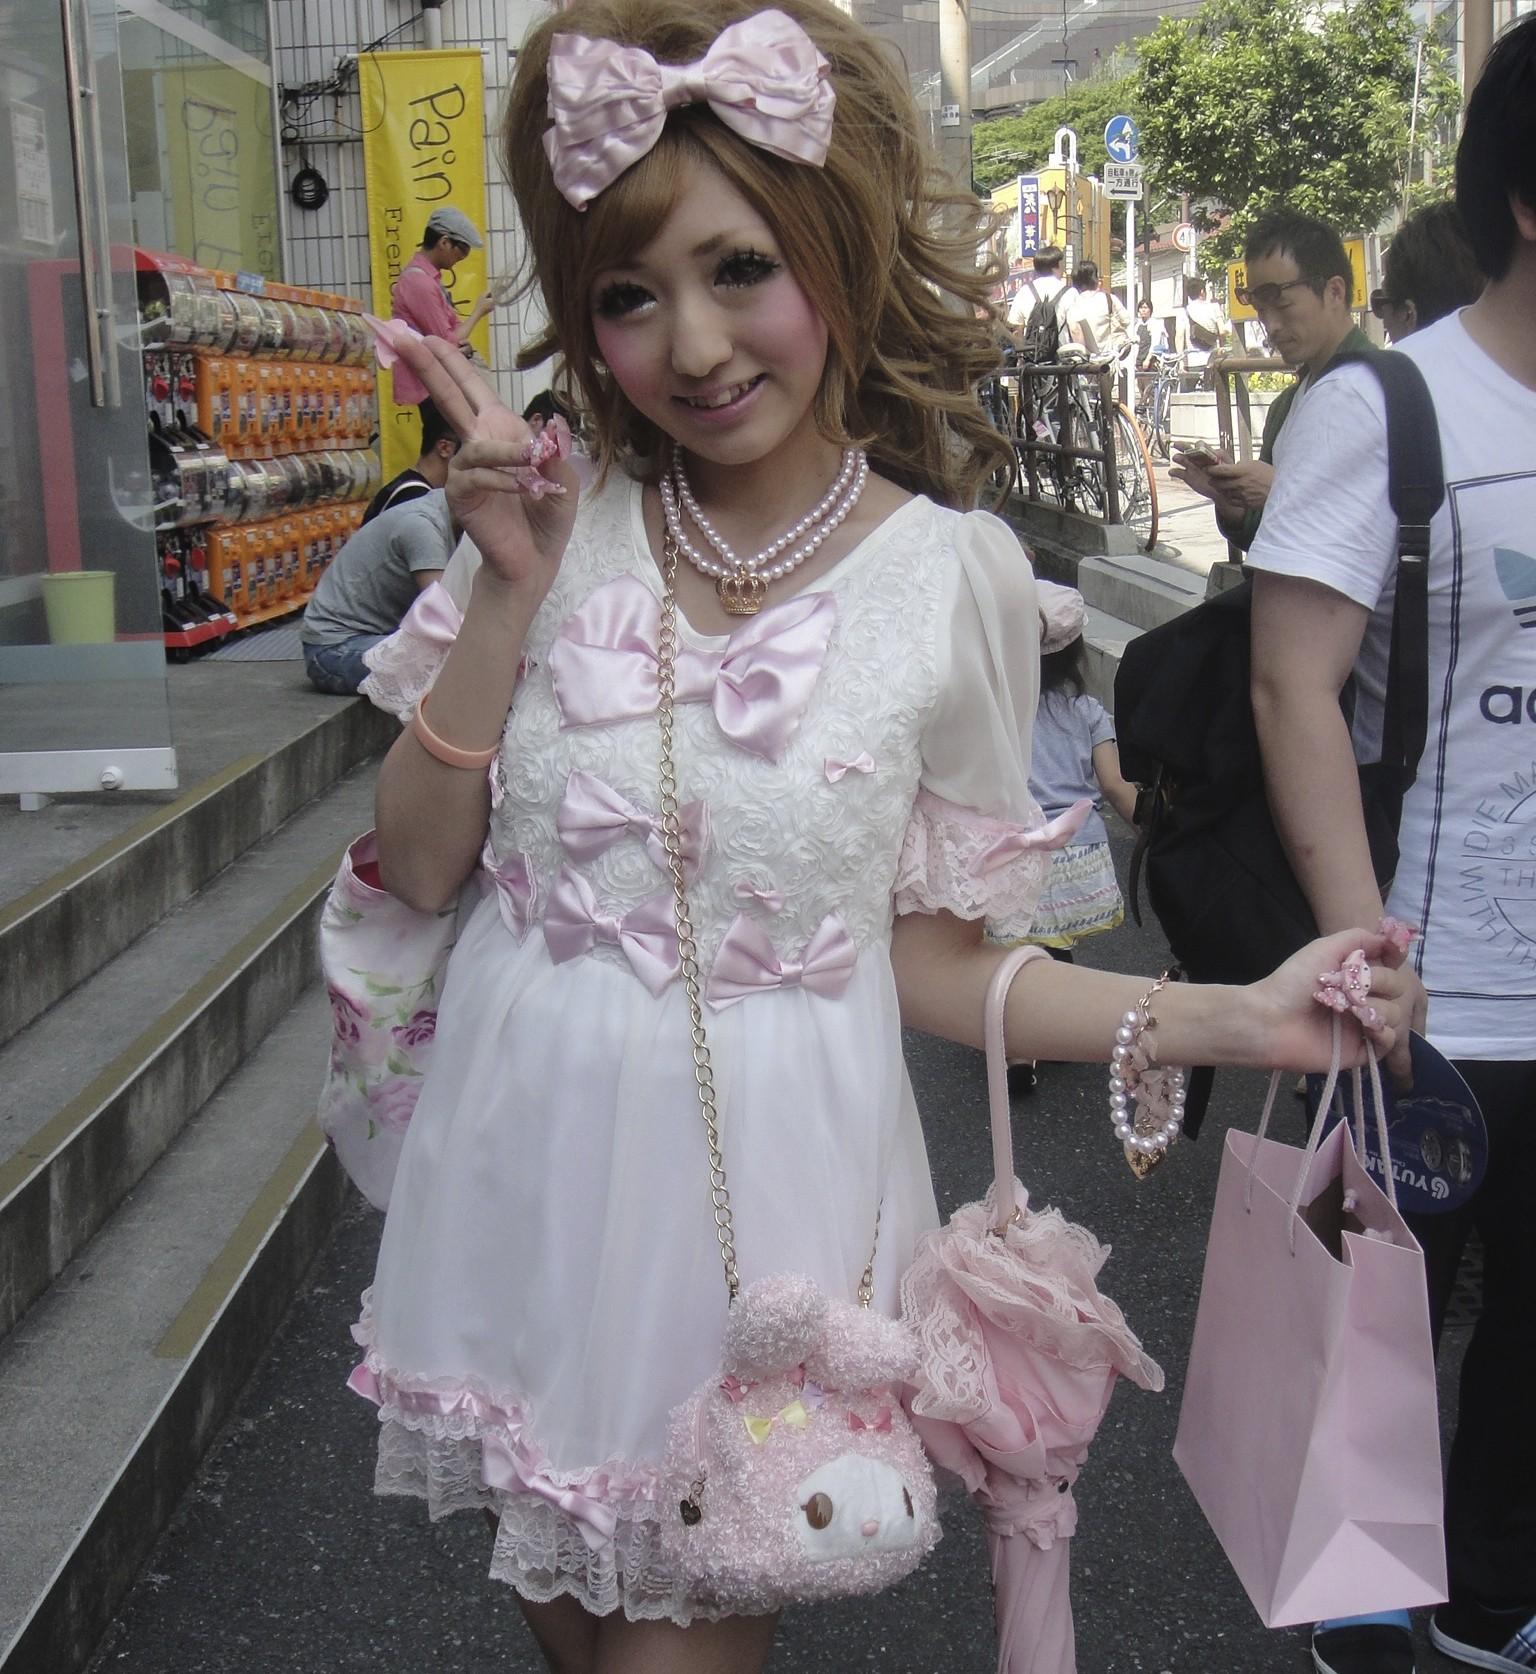 A sweet-loli or princess lolita look. The kawaii accessories take the look from Shibuya to Harajuku style | © Carrozza Lrn/WikiCommons